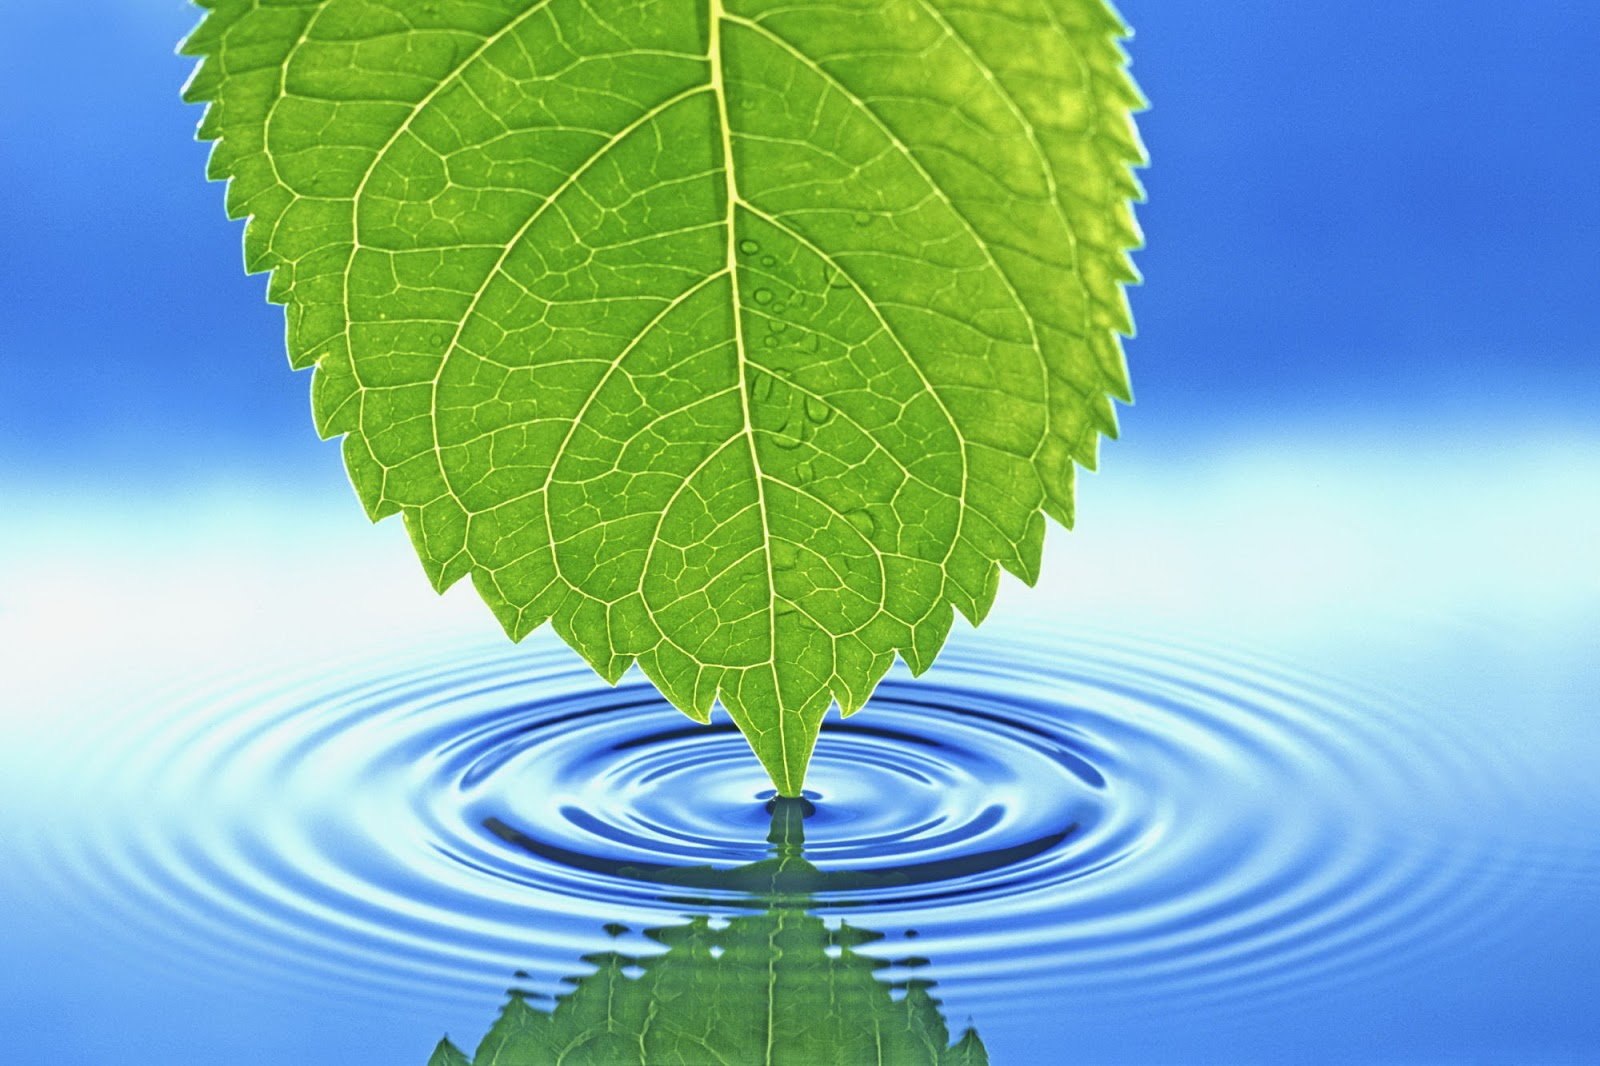 nature hd leaf 3d desktop wallpapers leaves background backgrounds artistic nice naturewallpaper amazing per cool